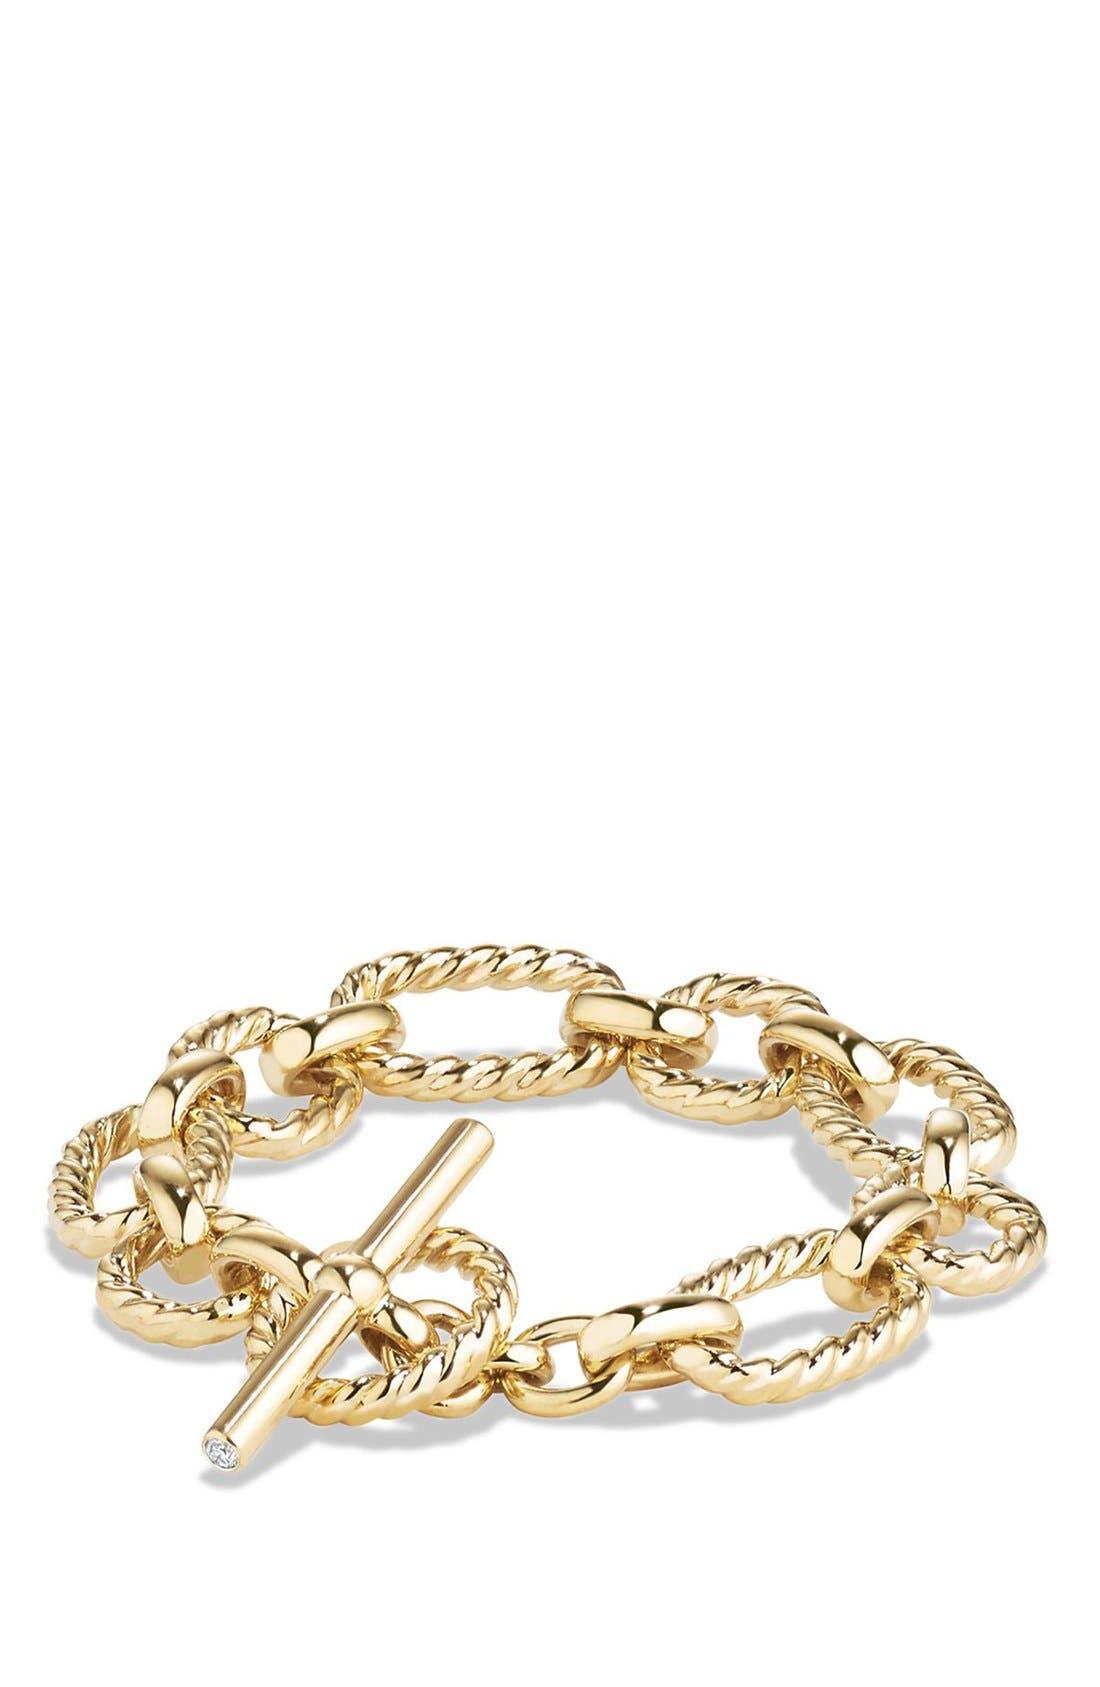 Main Image - David Yurman 'Chain' Cushion Link Bracelet with Diamonds in 18K Gold